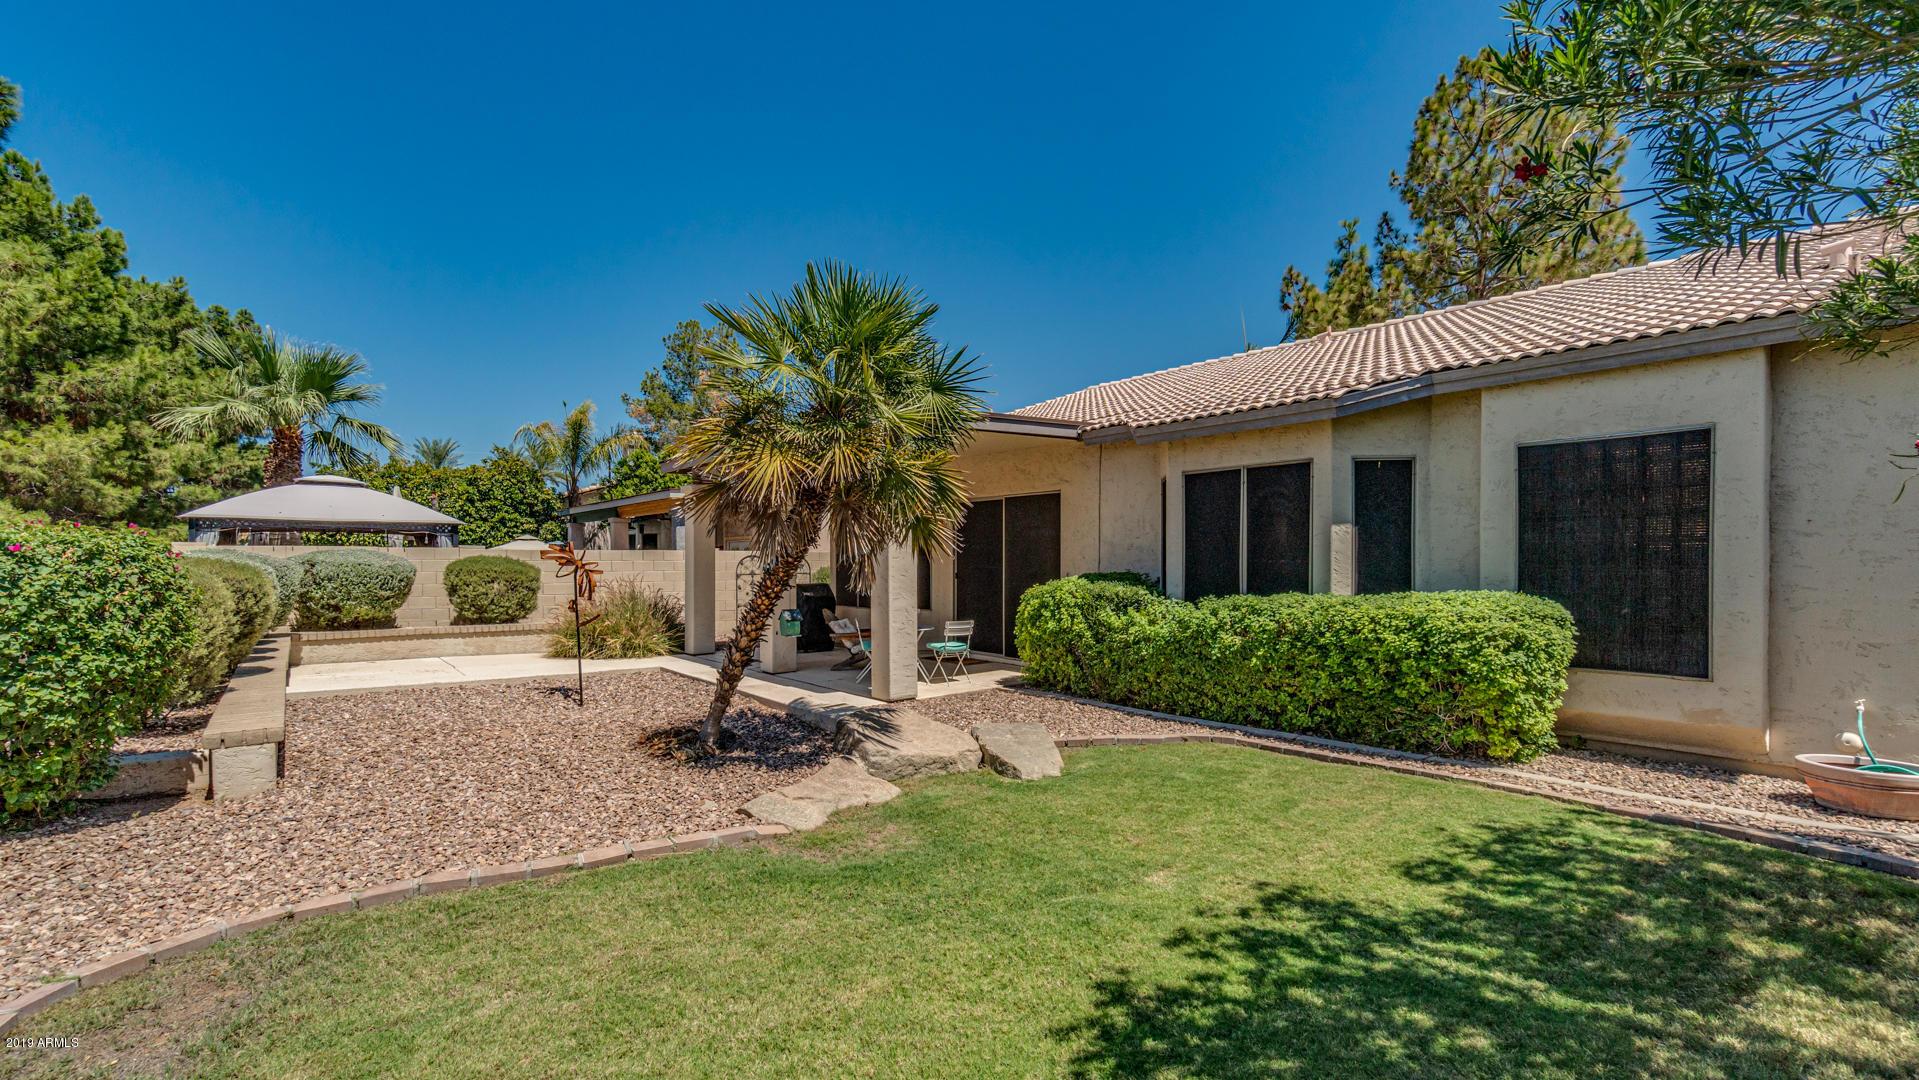 MLS 5971688 734 N CAMBRIDGE Street, Gilbert, AZ 85233 Gilbert AZ Cayman Square